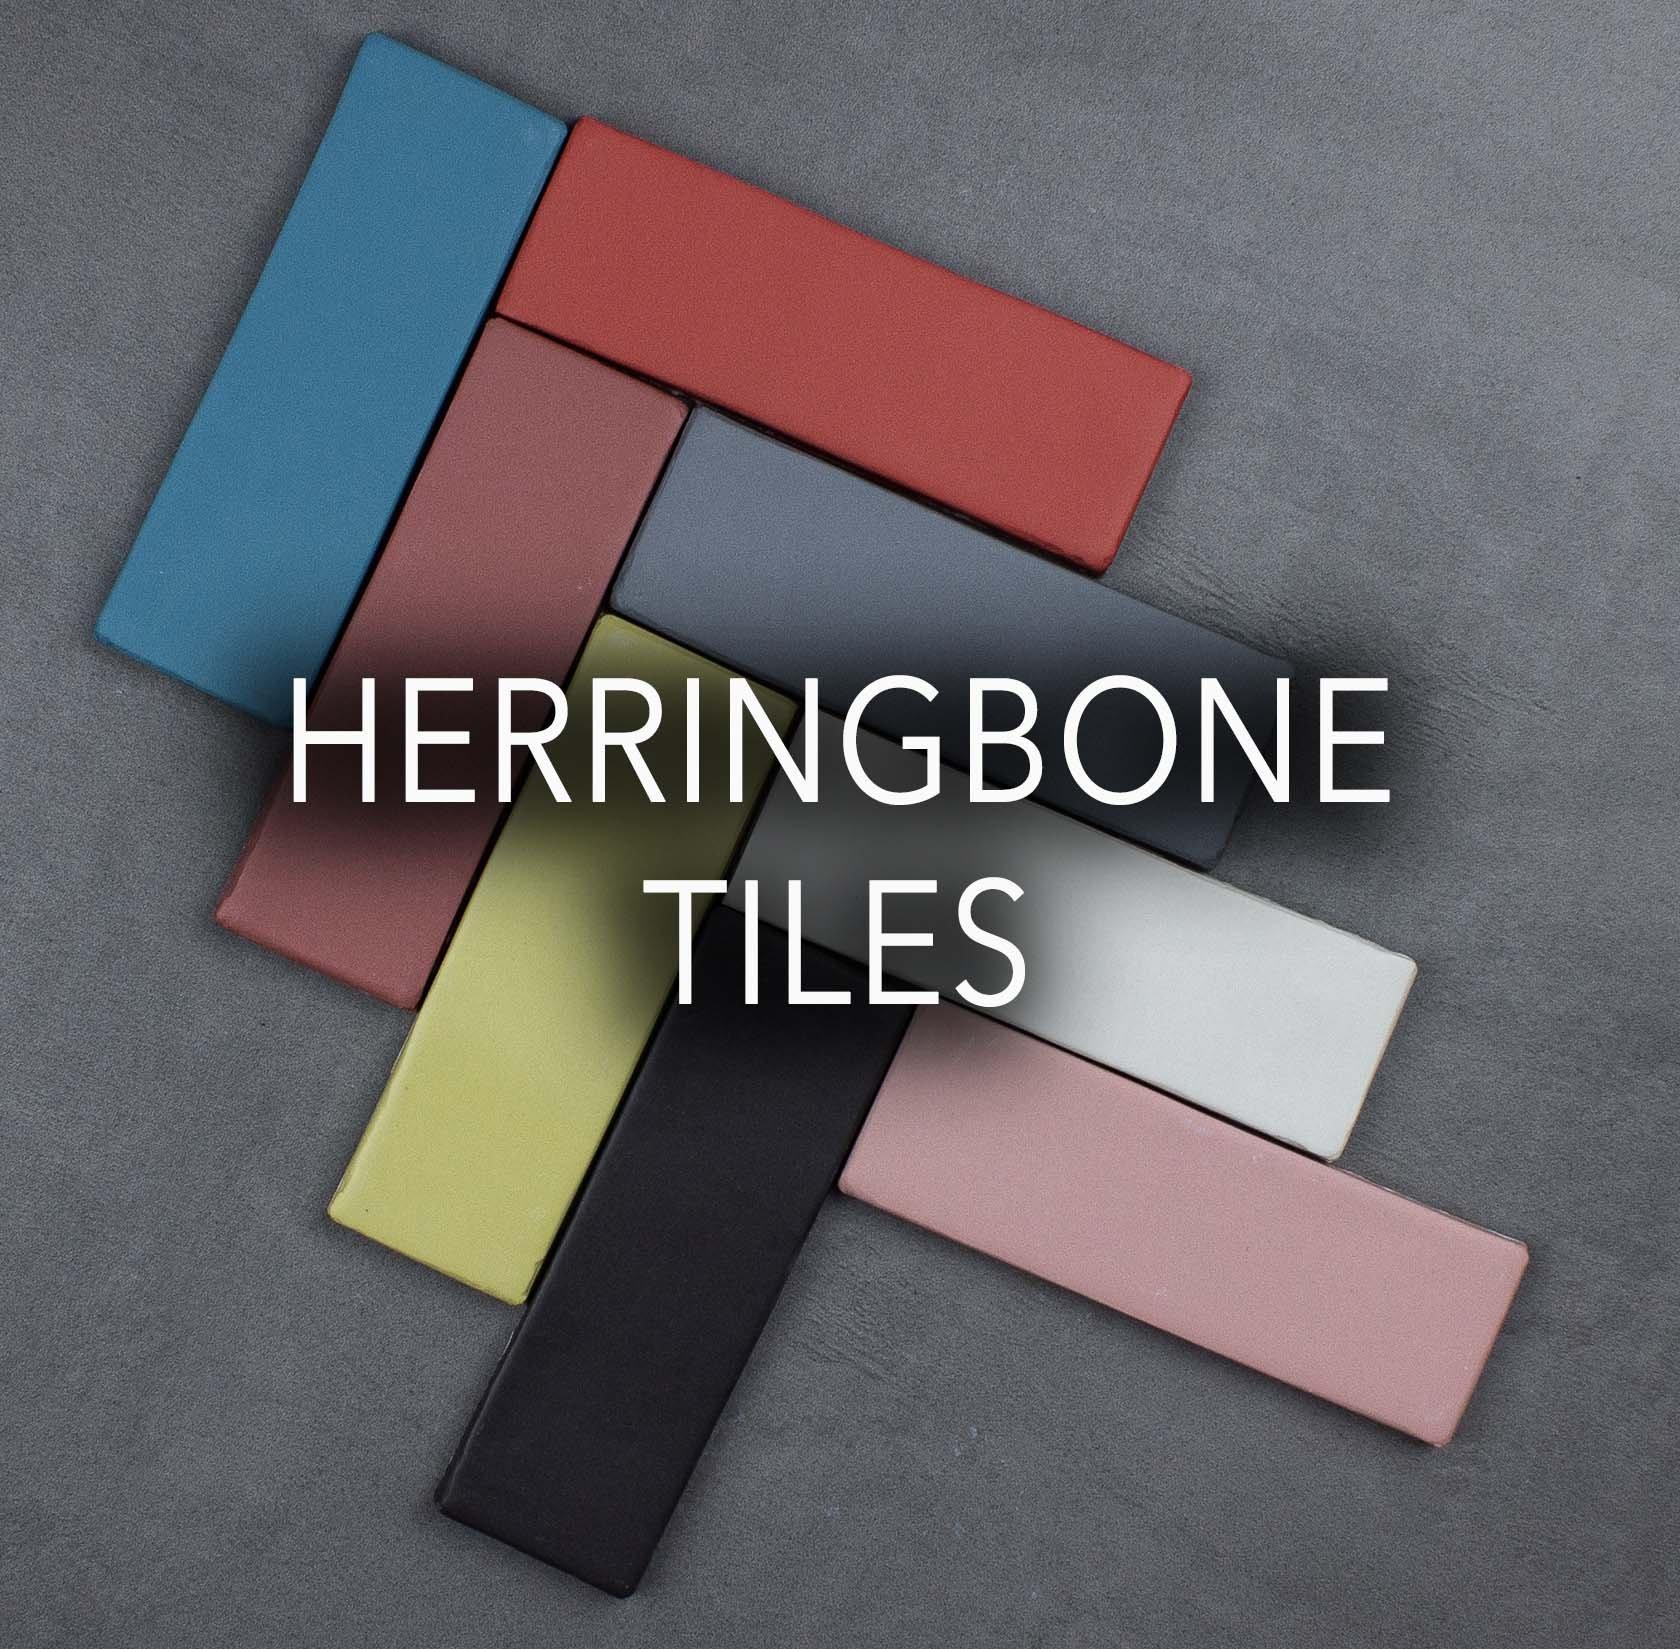 Herringbone Porcelain tiles